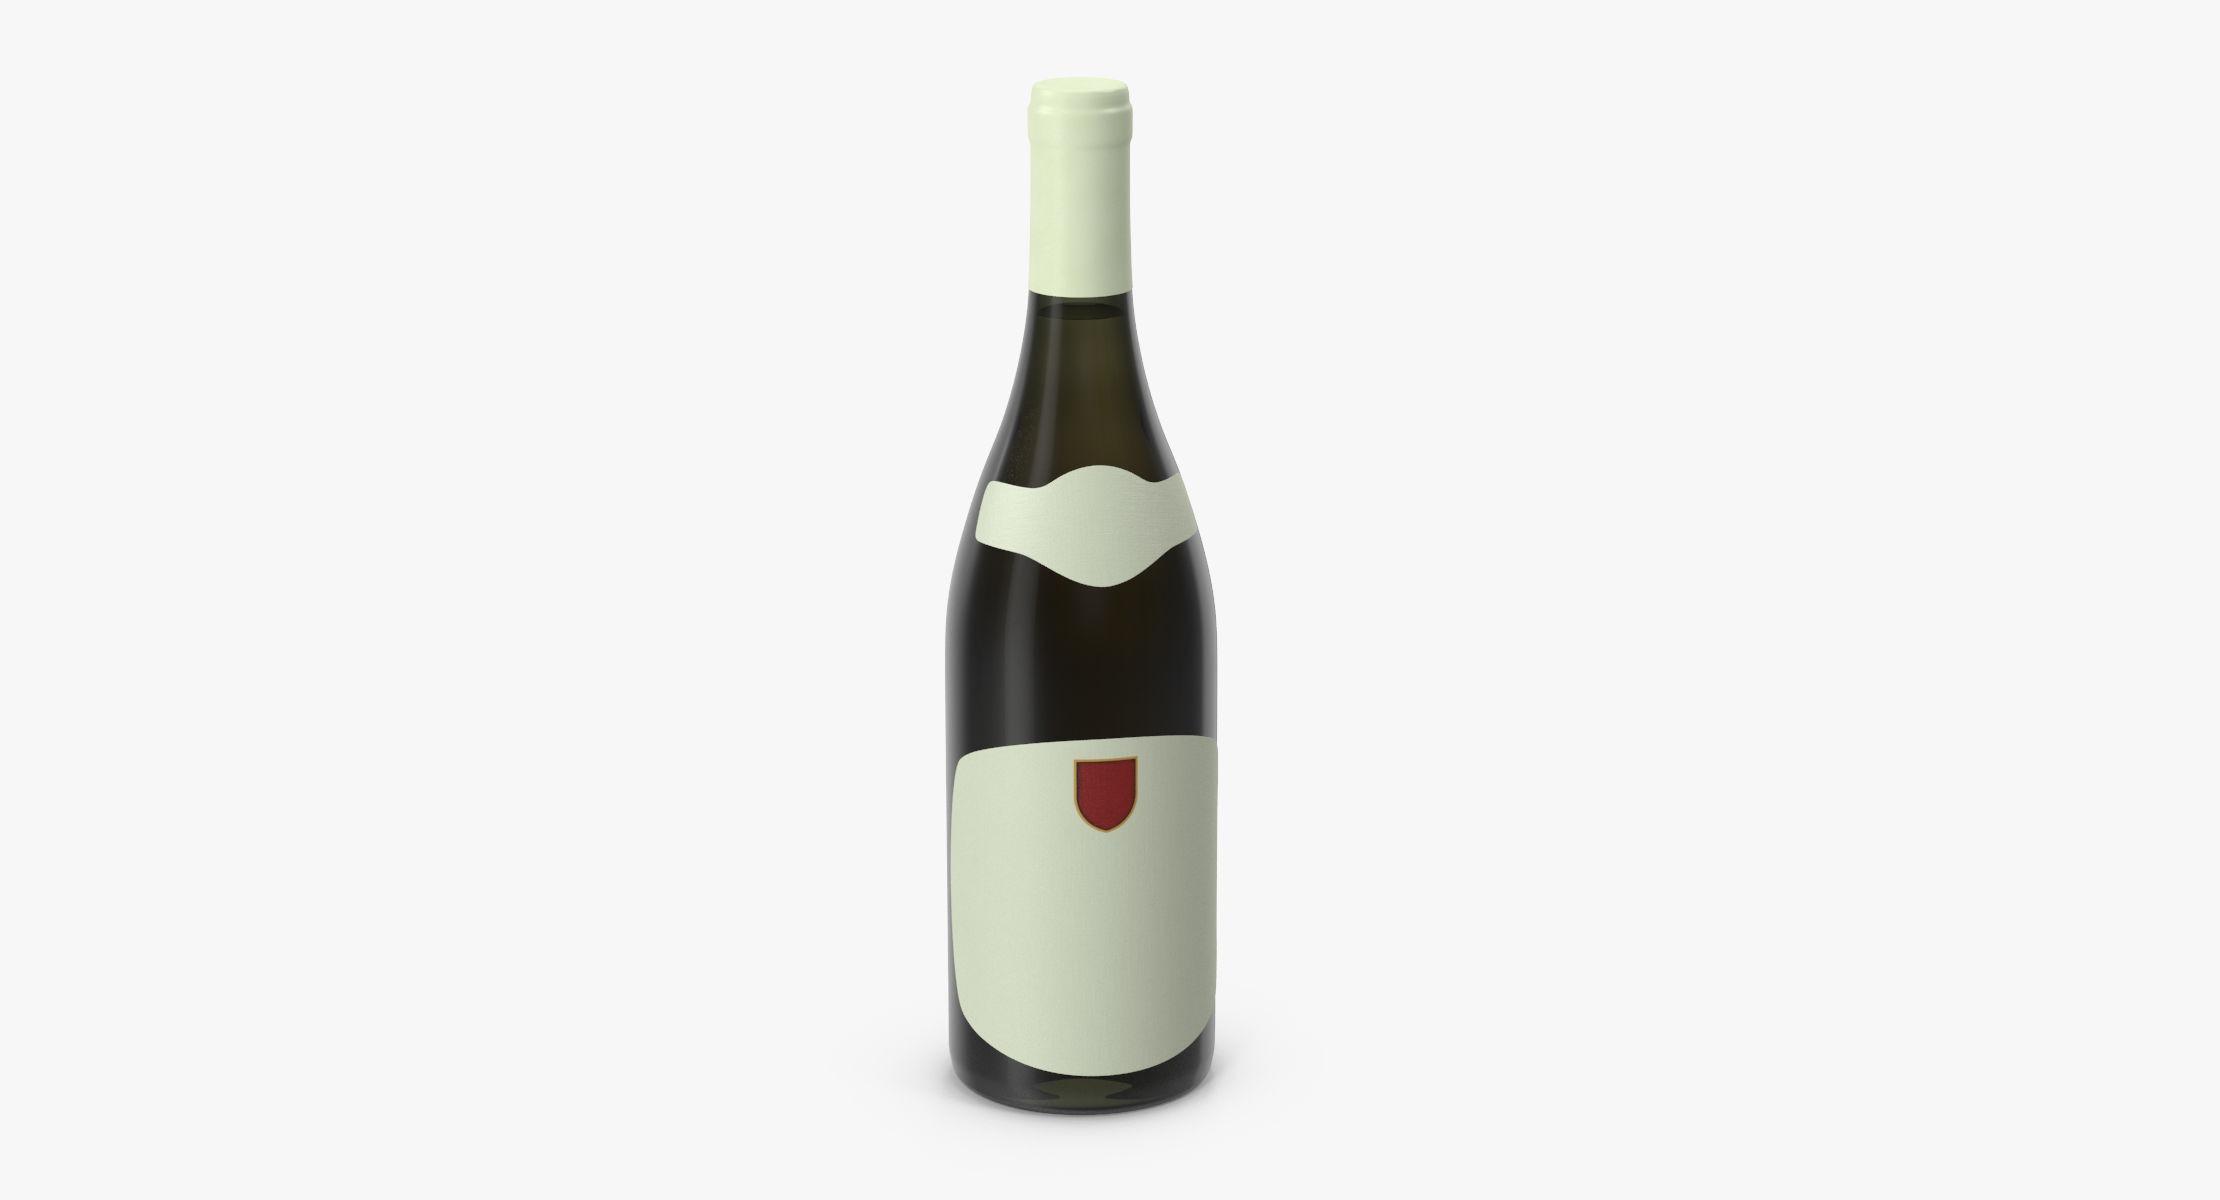 Chardonnay Bottle Closed - reel 1